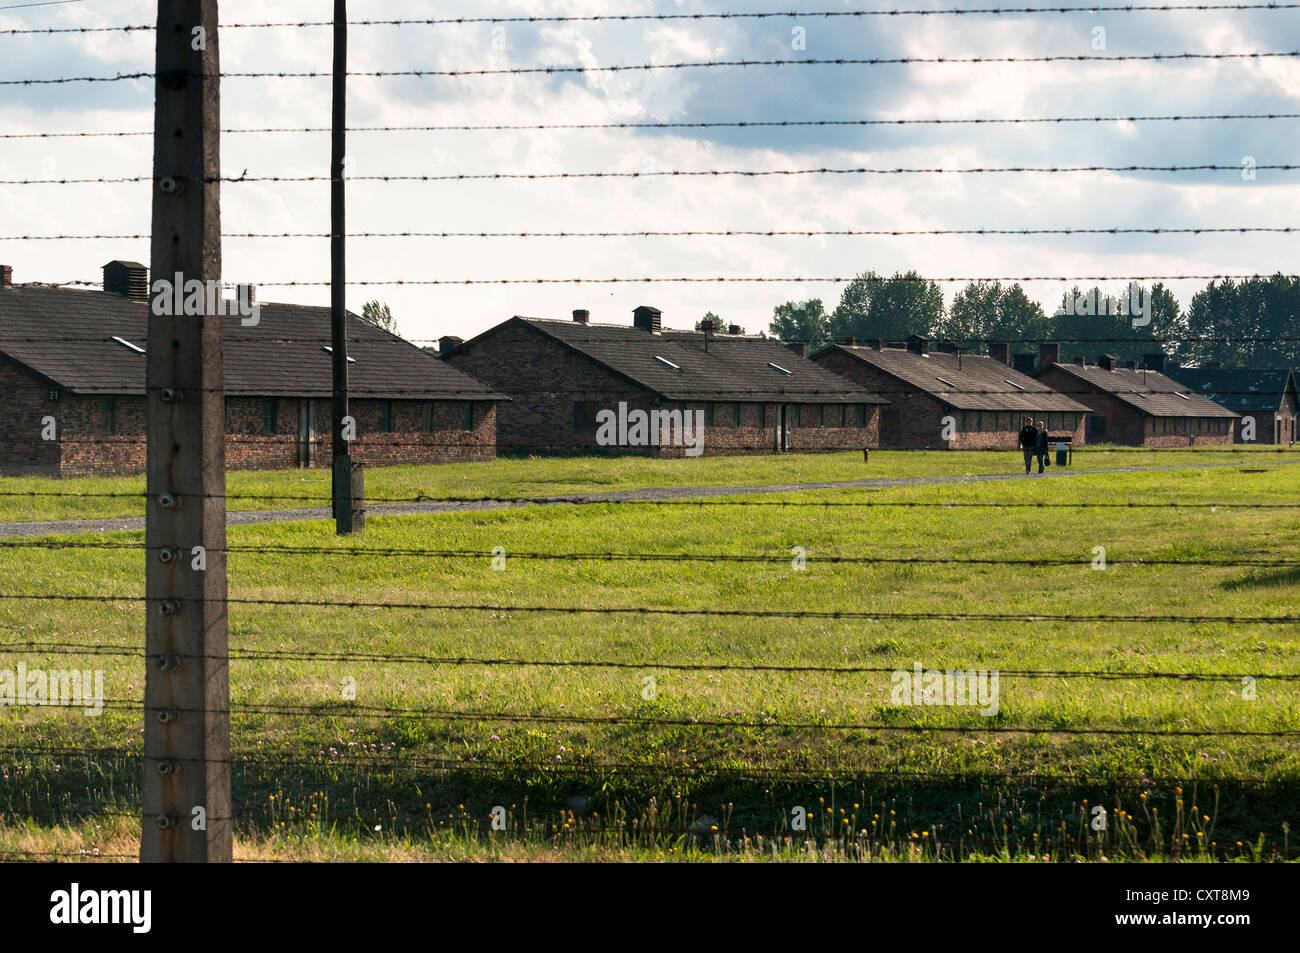 Barbed wire fence and barracks, Auschwitz-Birkenau concentration camp, Auschwitz, Lesser Poland, Poland, Europe - Stock Image